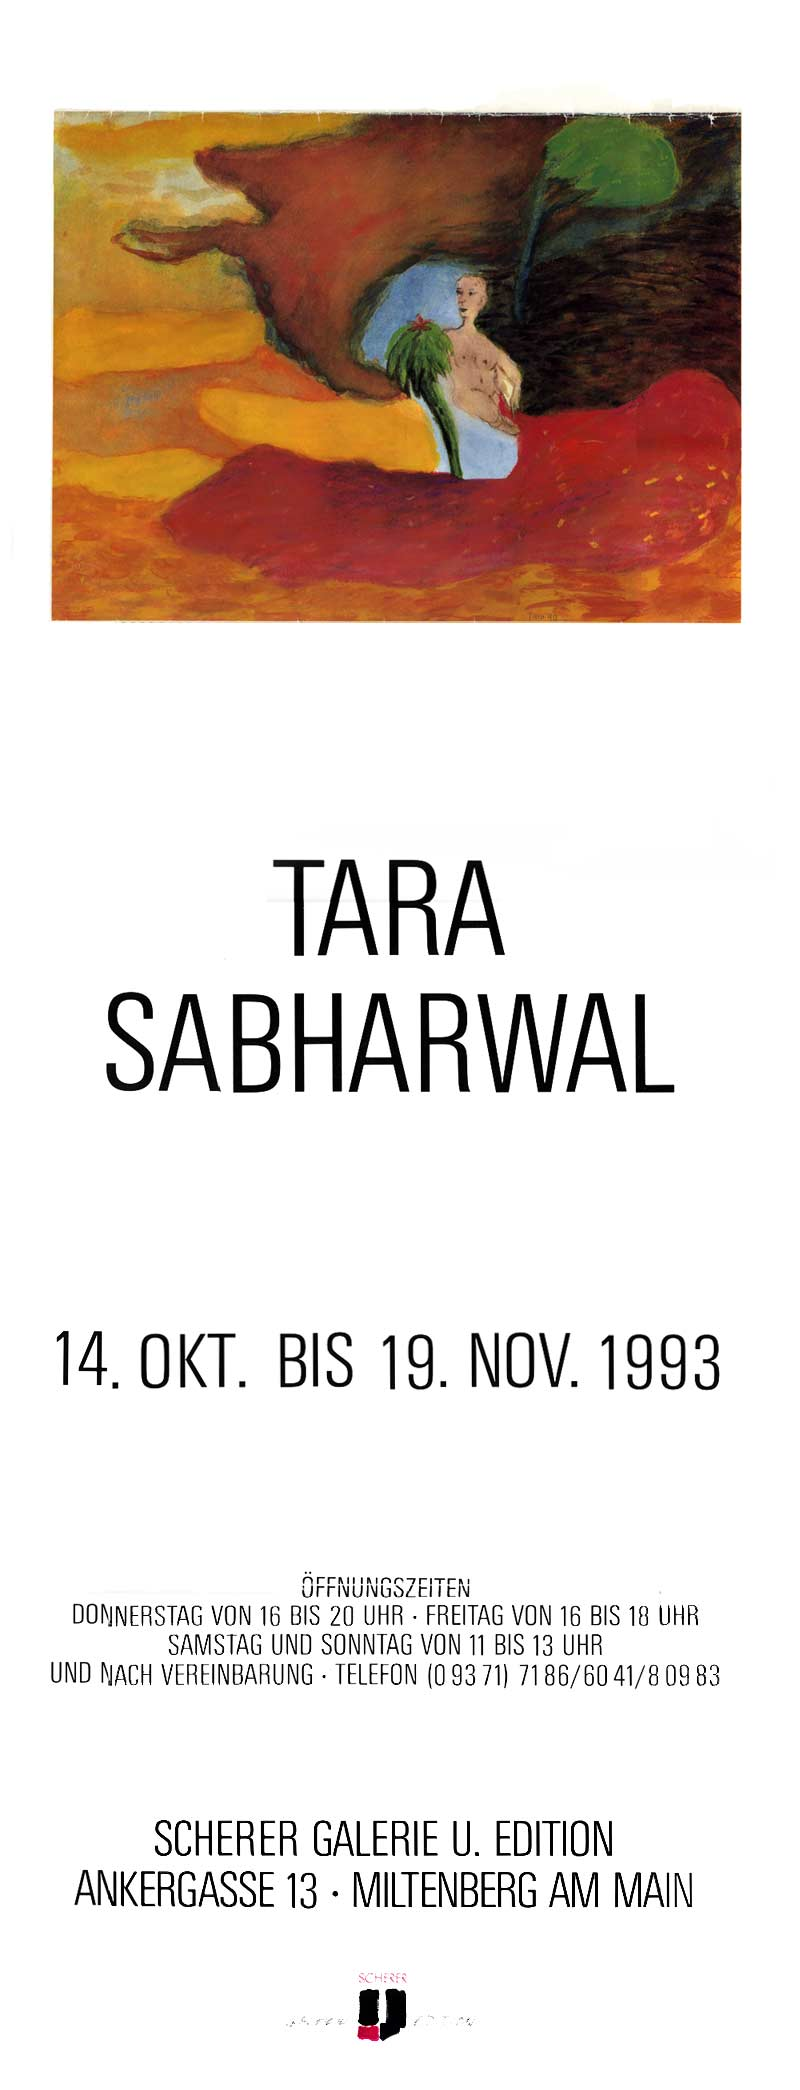 Tara Sabharwal, poster